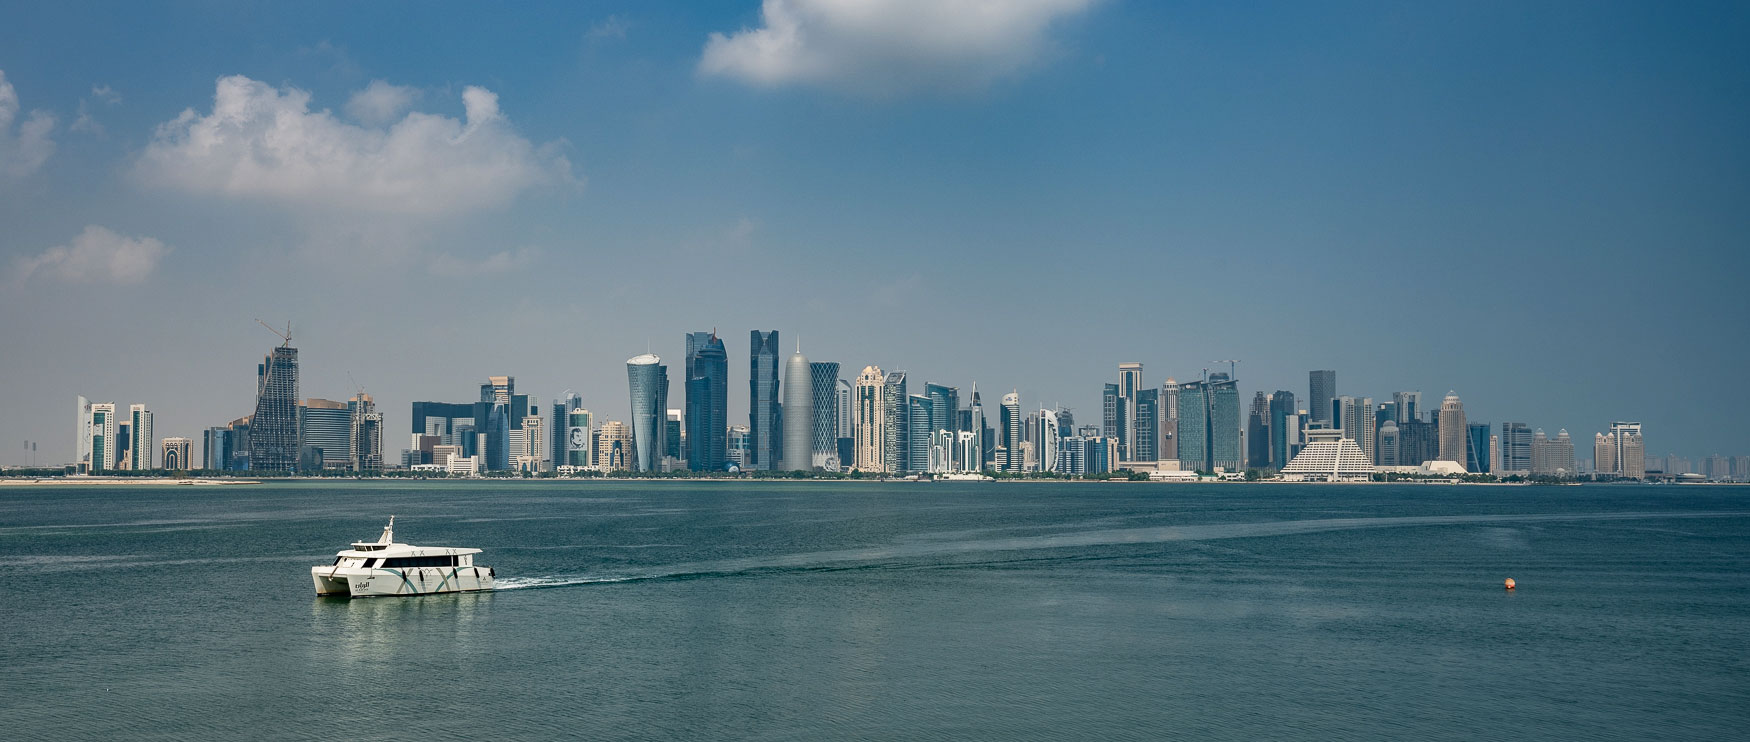 Qatar Tipps: Asublick Museum of Islamic Art